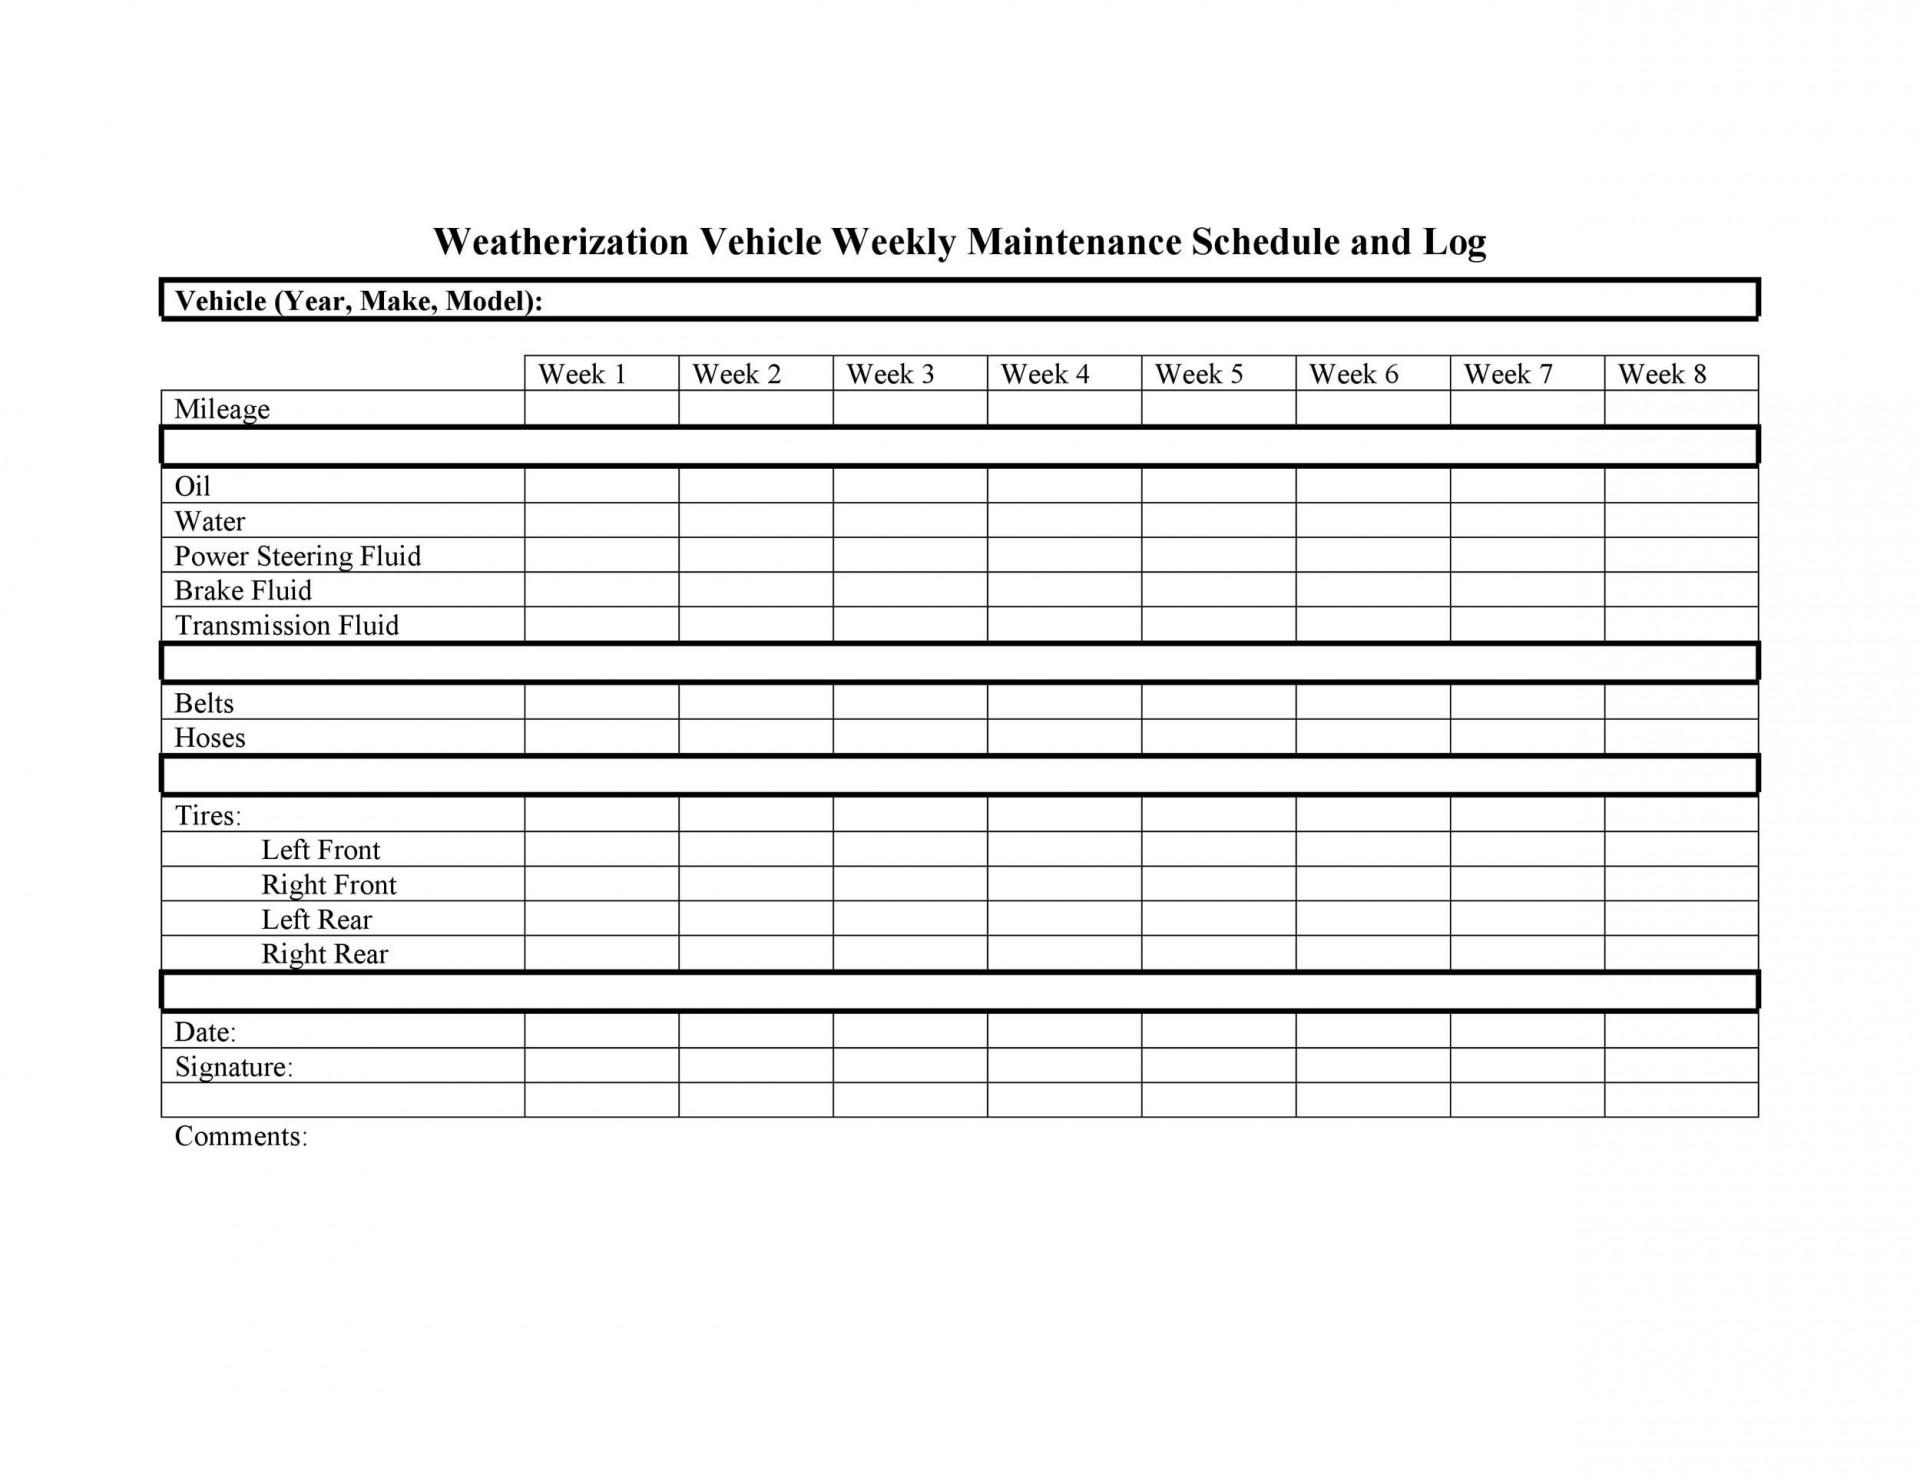 005 Best Car Maintenance Schedule Template High Resolution  Vehicle Preventive Excel Log1920